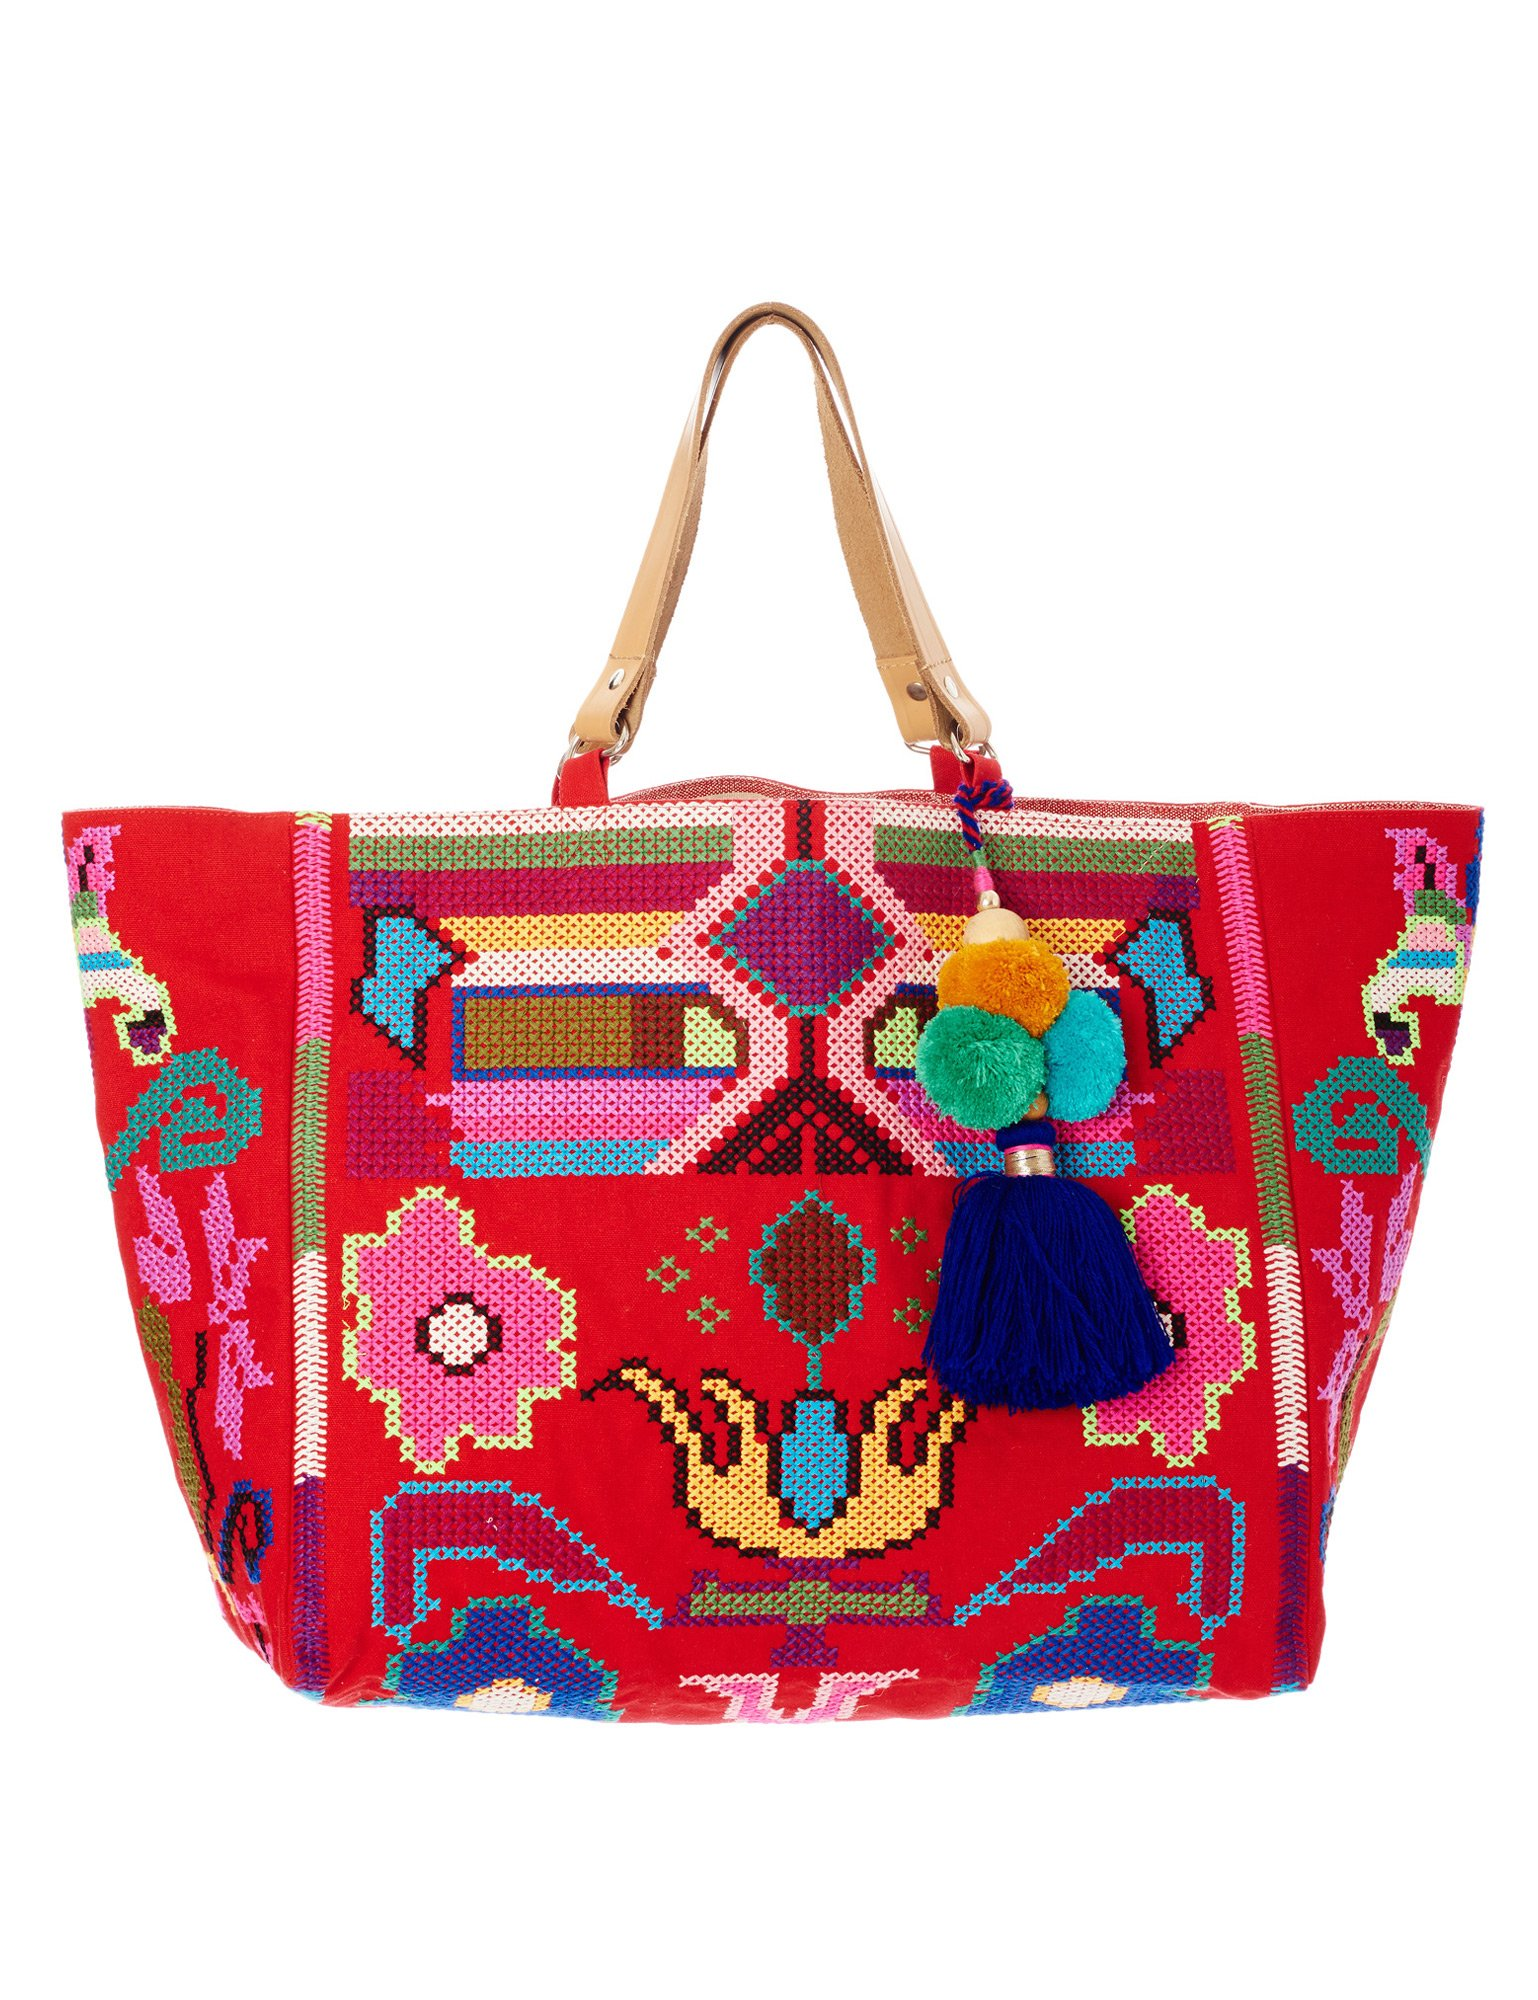 Star Mela Women's Vita Women's Red Tote Beach Bag 100% Cotton